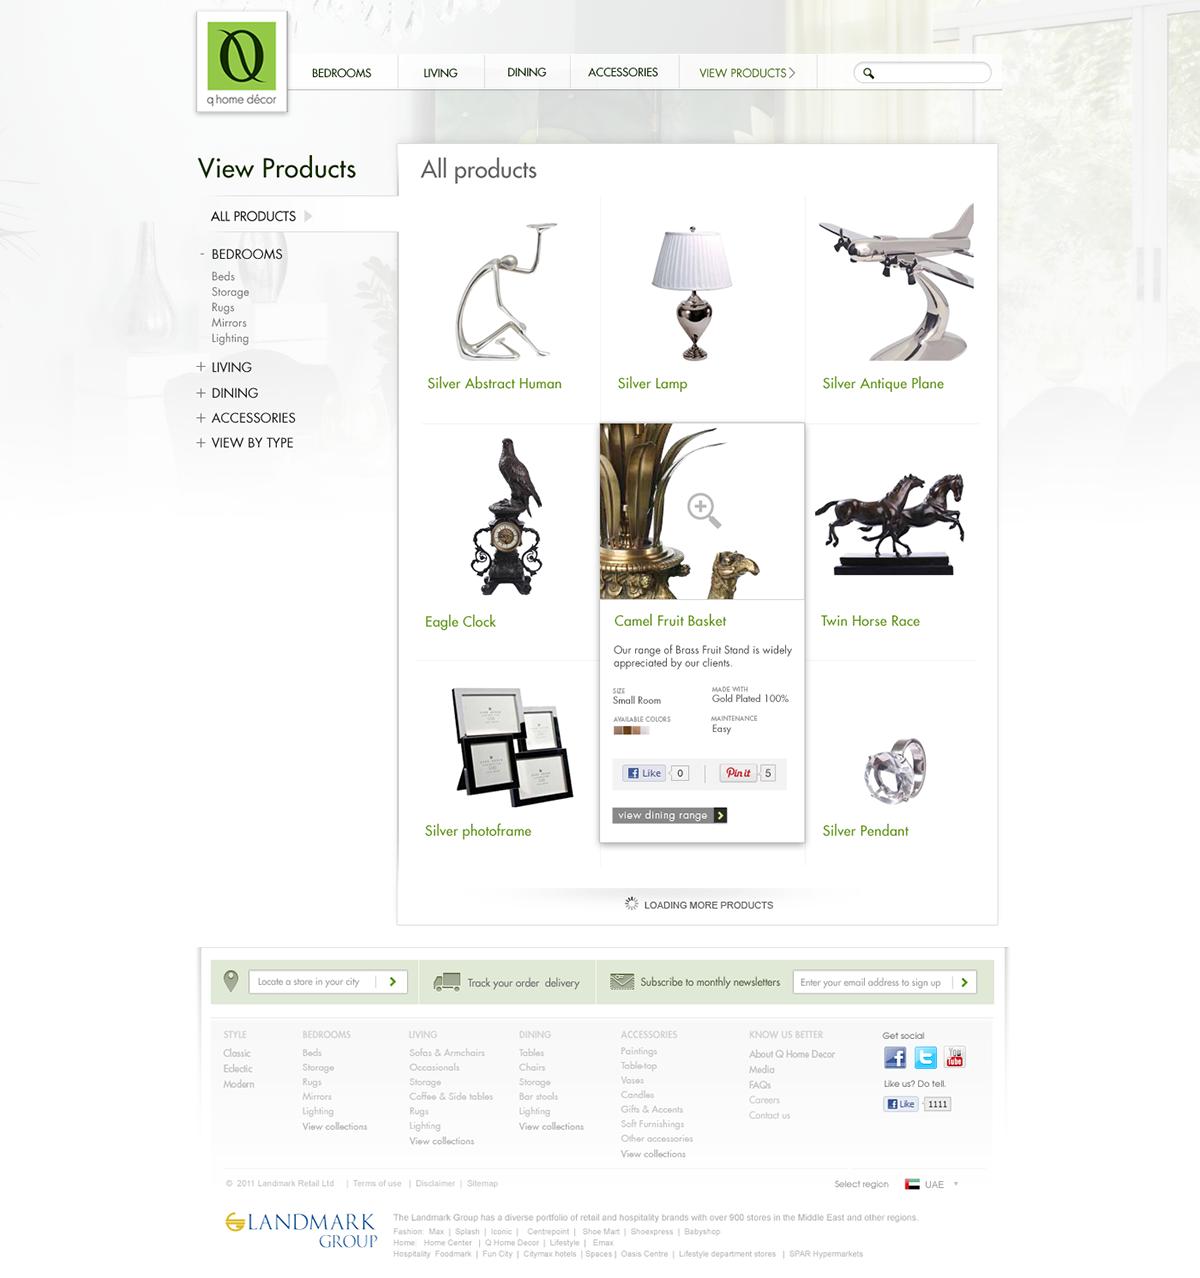 Q Home Decor india web design home decoration online furniture collection lifestyle website  dubai